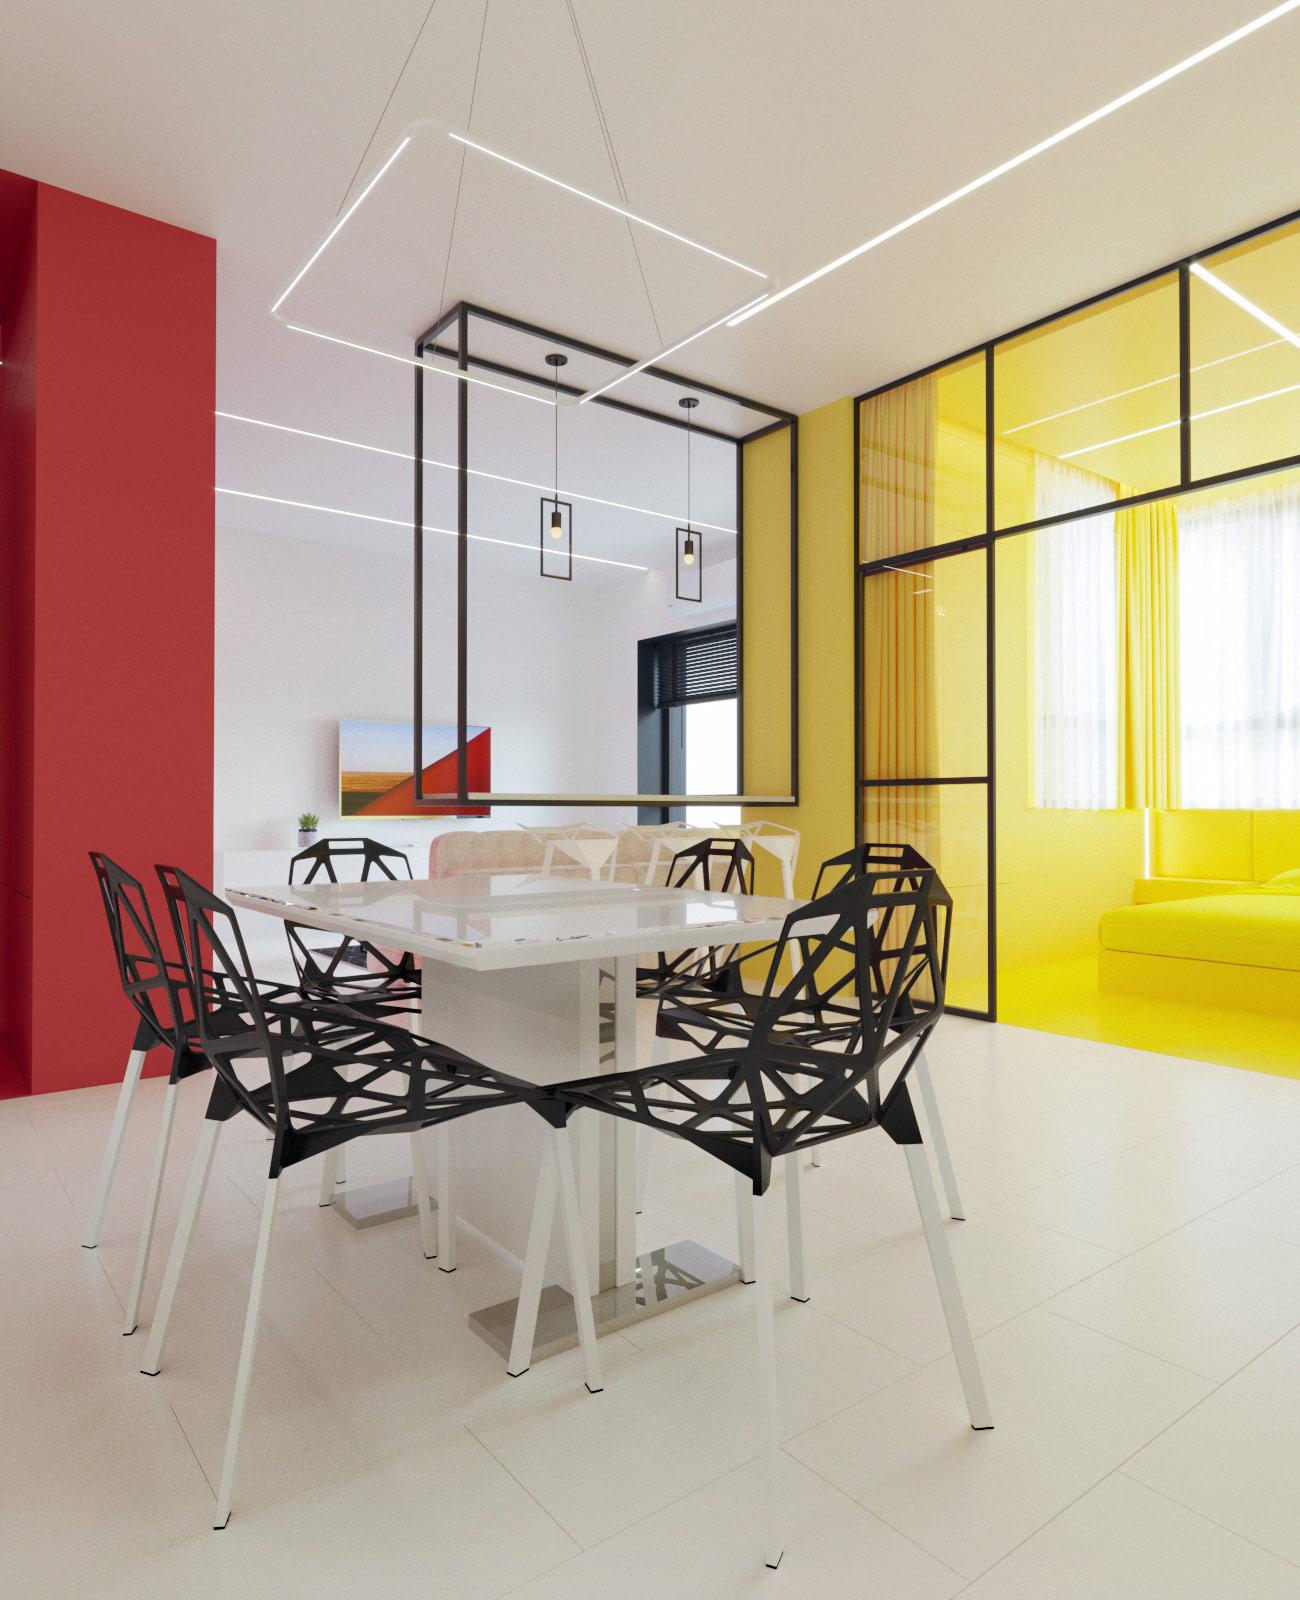 Mondrian-интерьер с Геометрическими Акцентами: Фотообзор